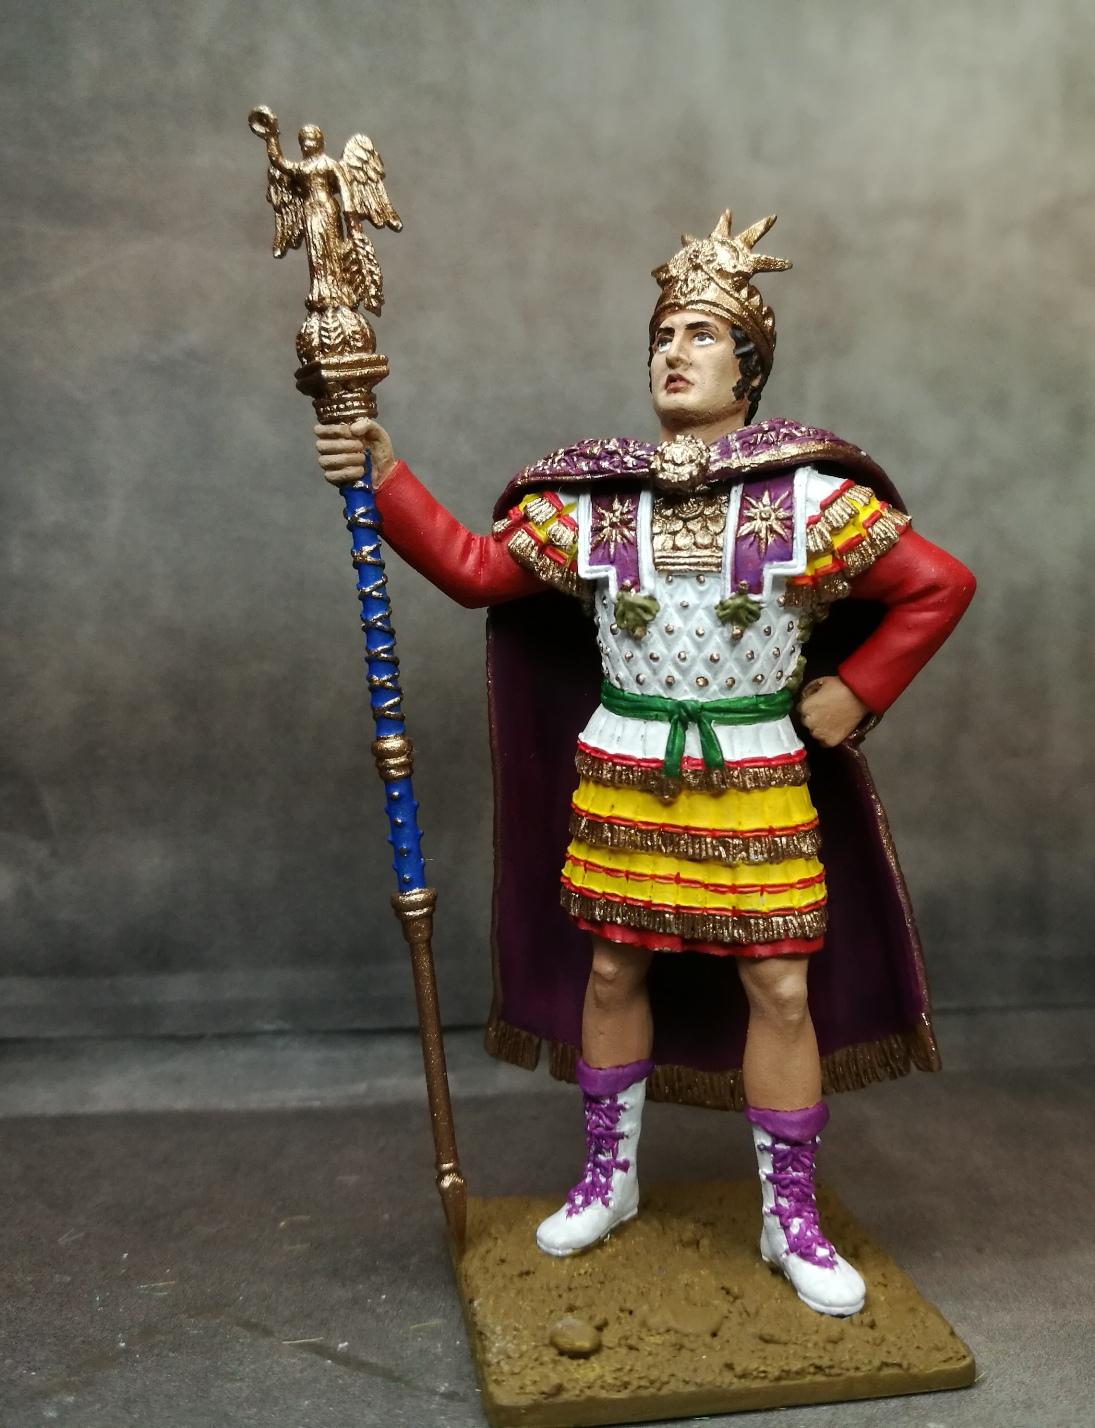 Alexander The Great, Macedon,  King , Μεγας  Αλεξανδρος, Μακεδων, Μακεδ